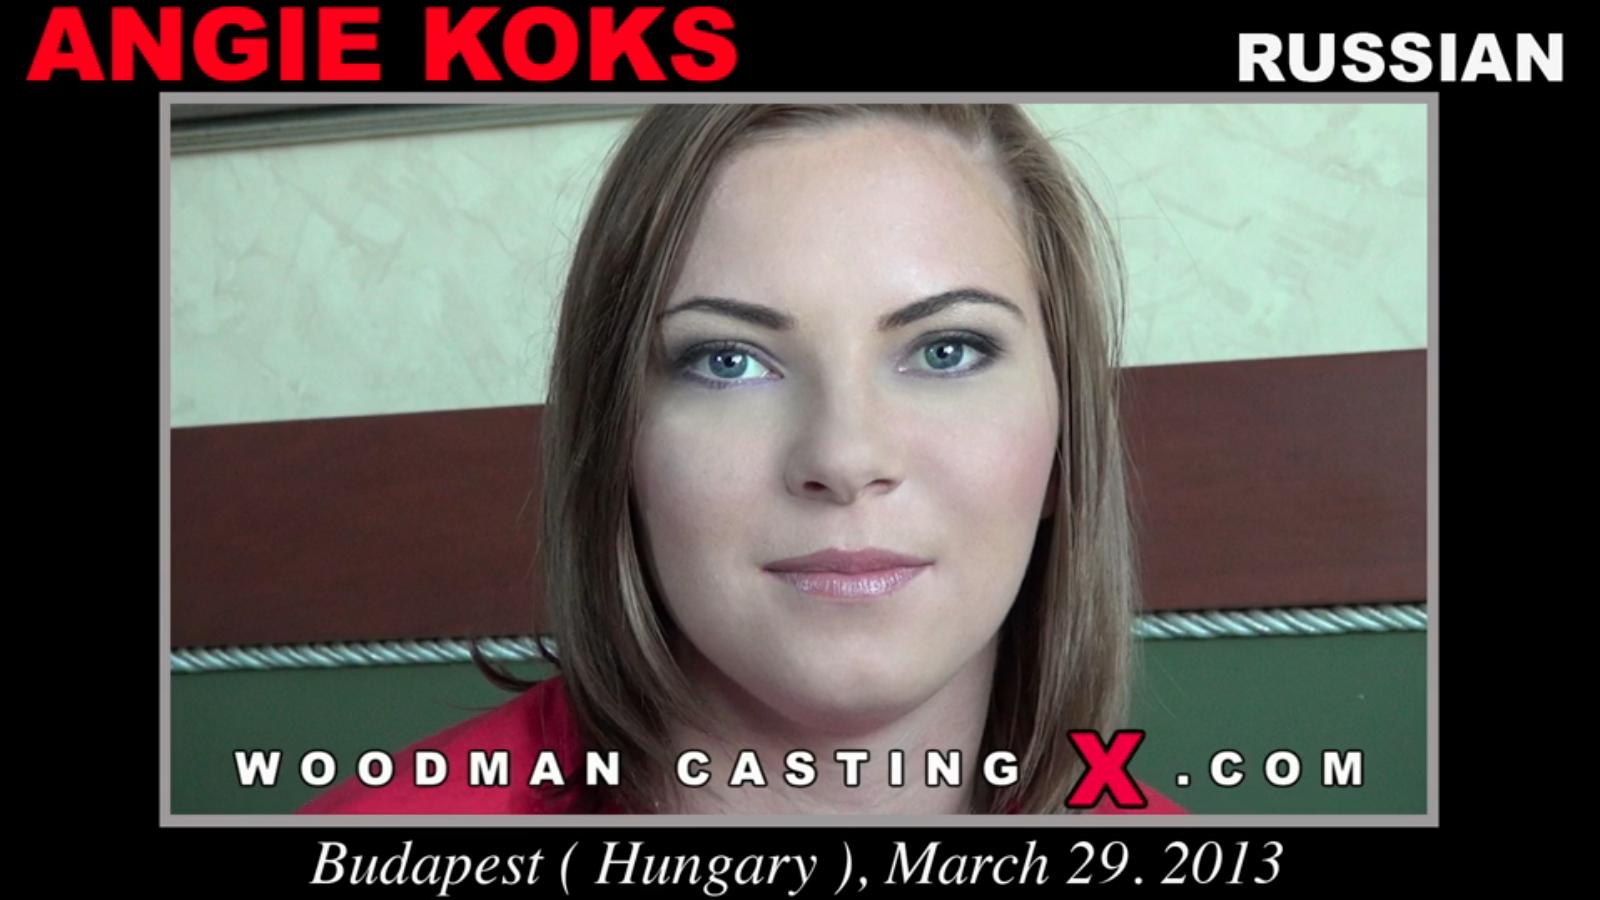 Angie Koks Woodman Casting X